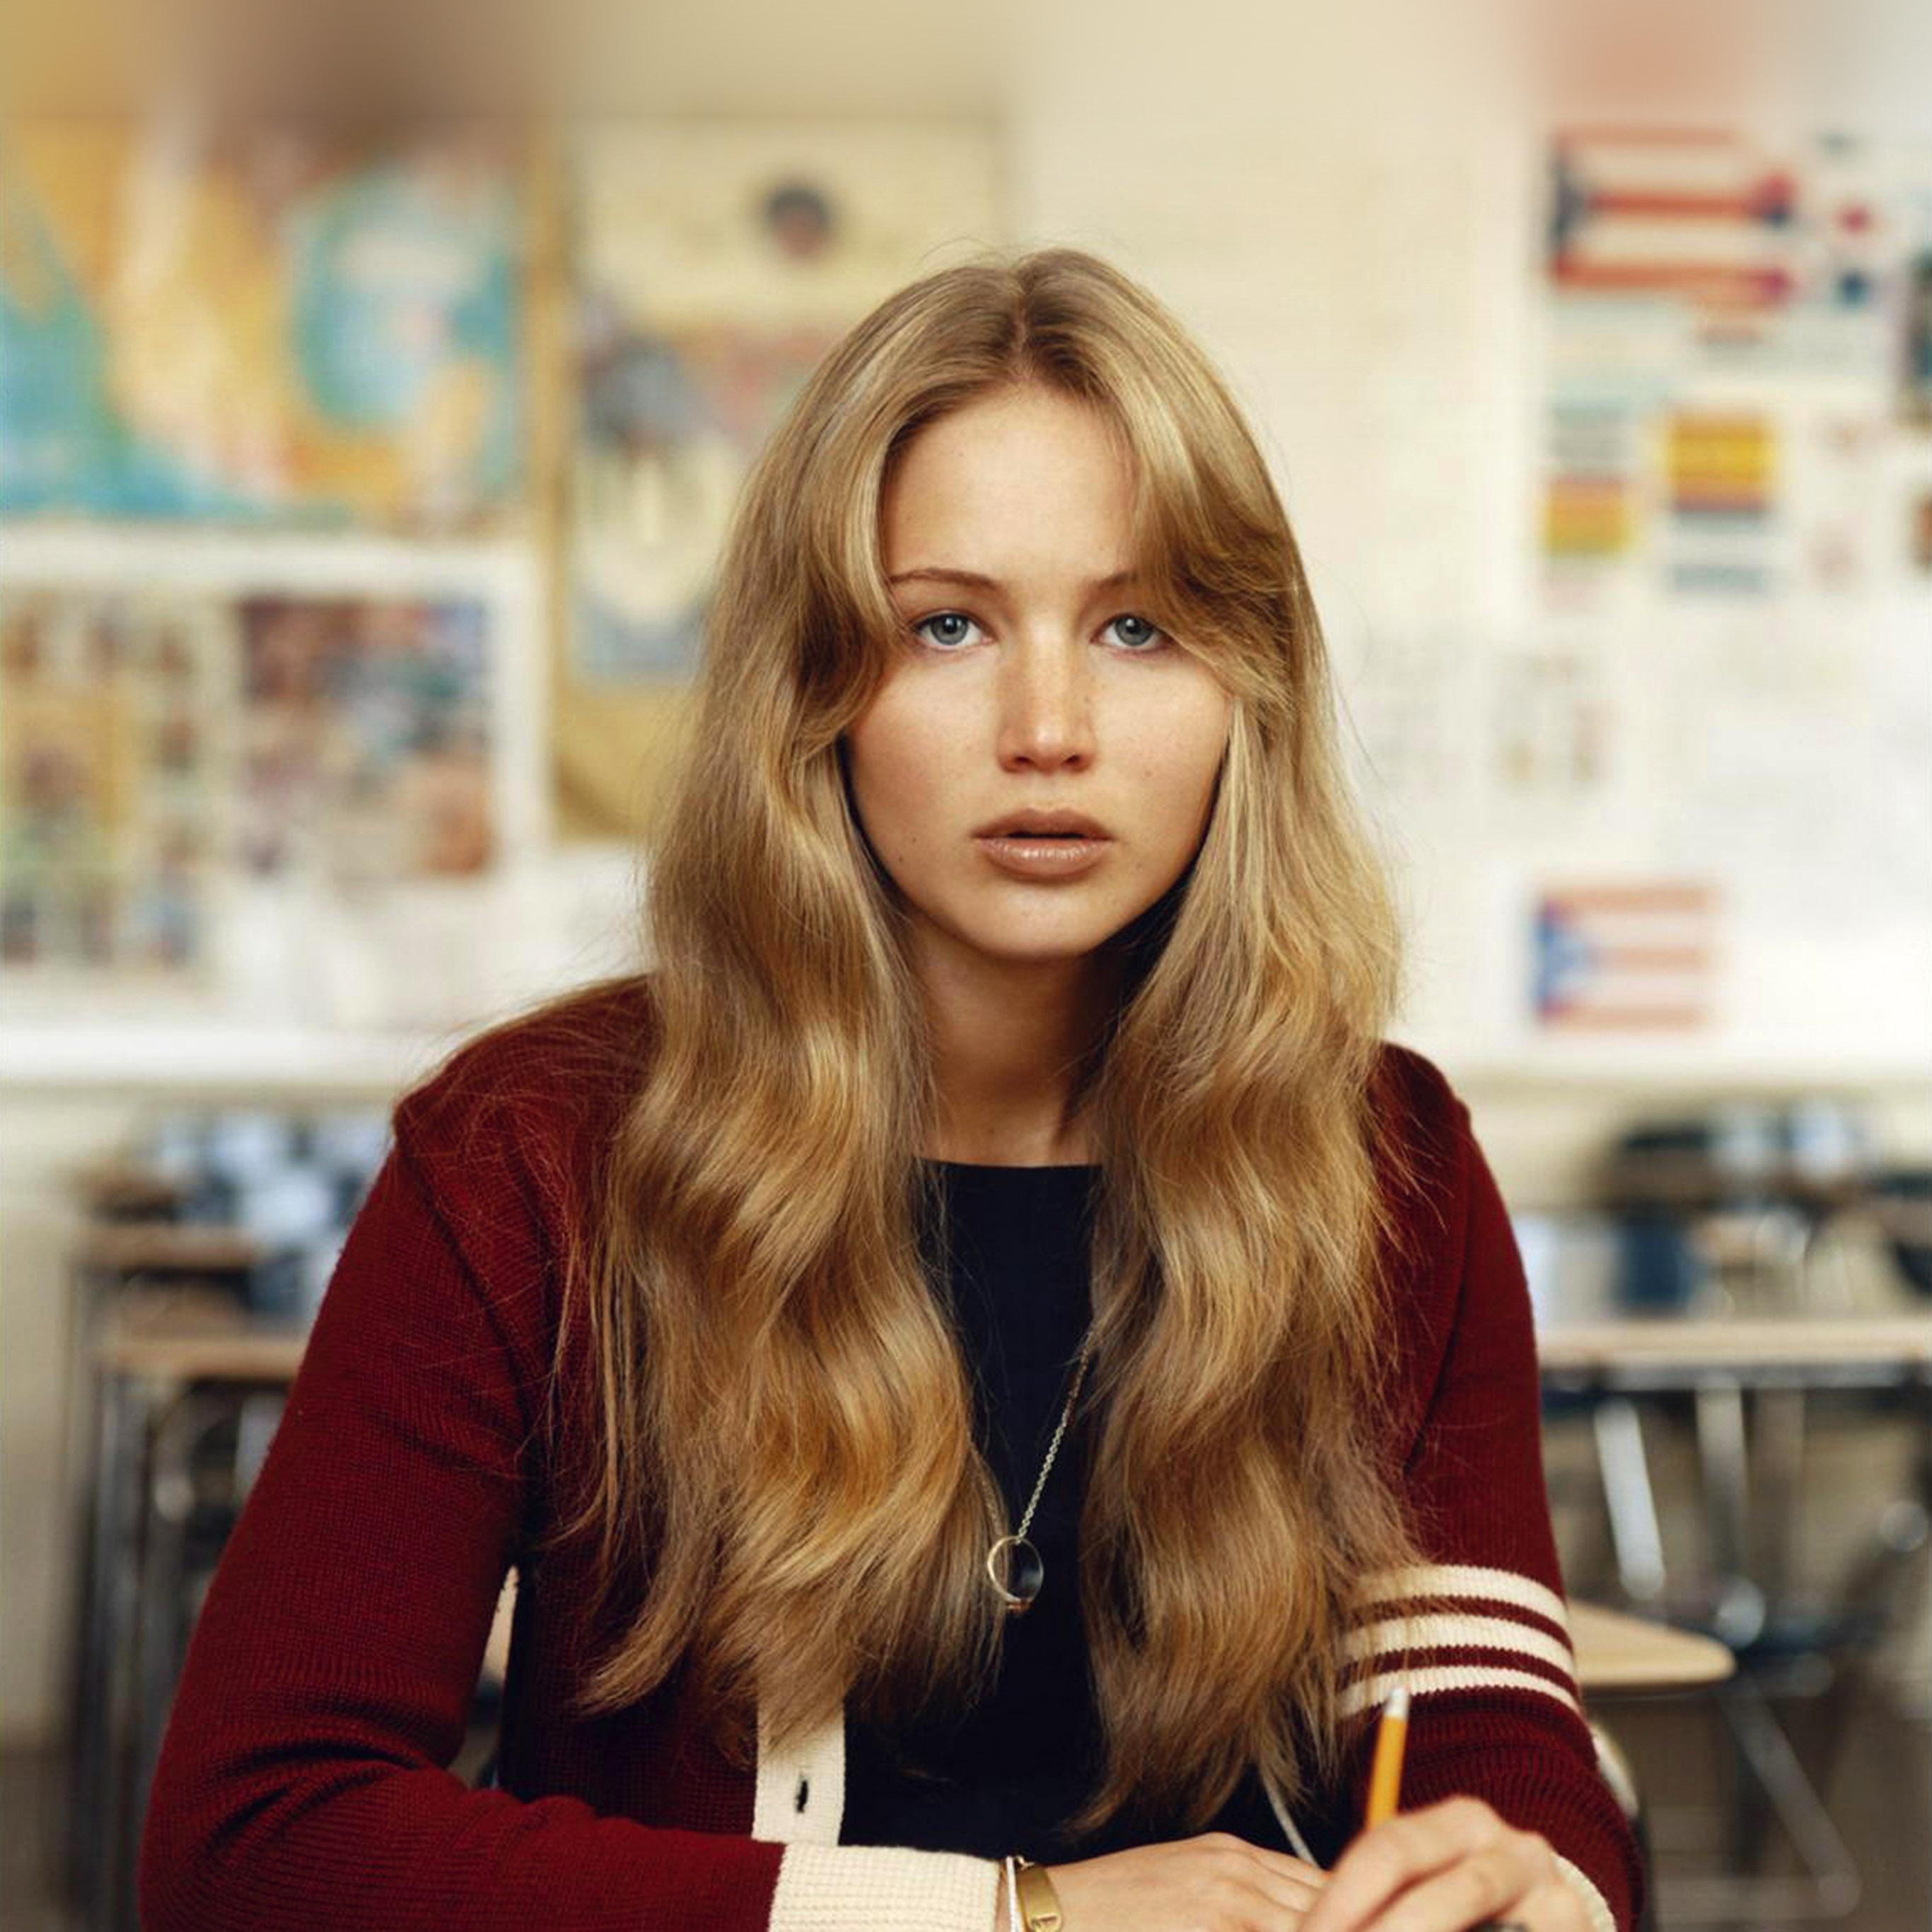 Hr82 Jennifer Lawrence Girl Film Cute Wallpaper